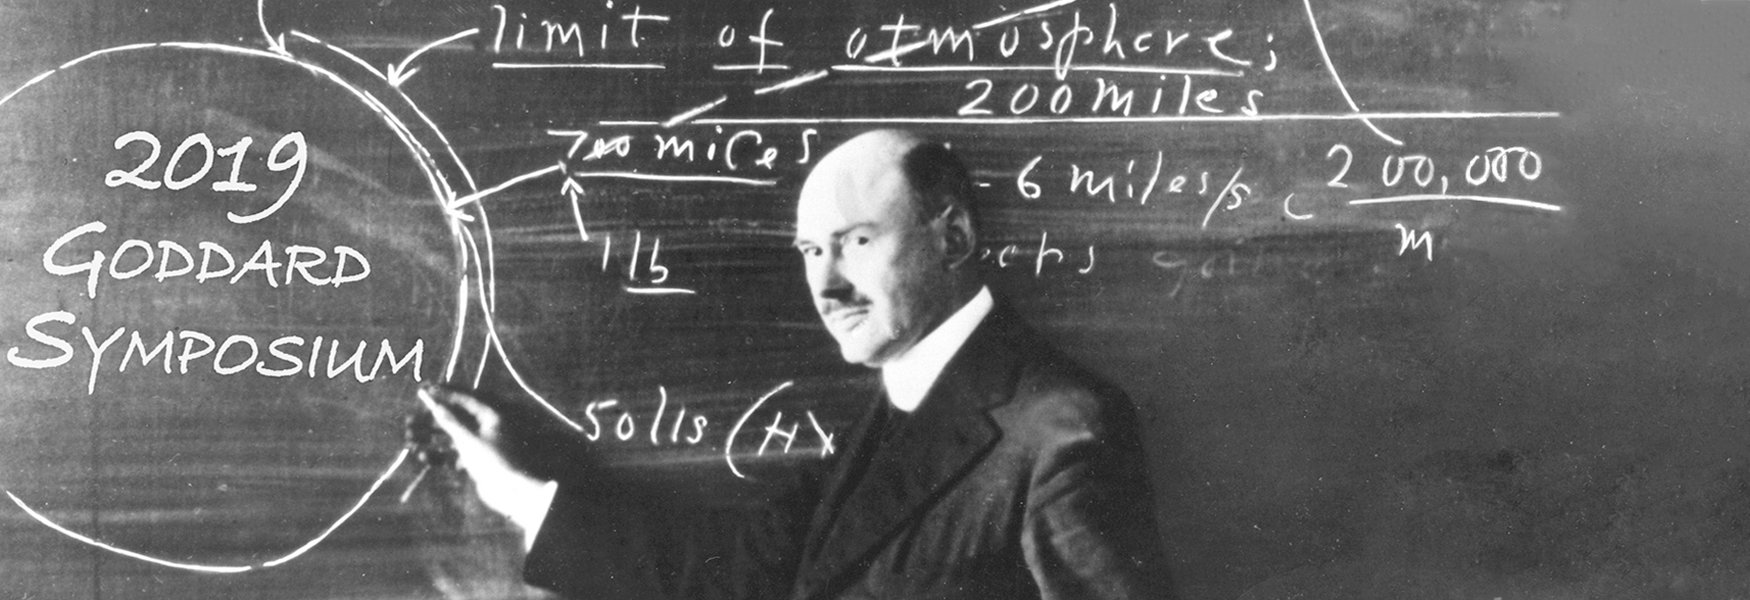 2019 Robert H. Goddard Memorial Symposium – Registration Open!